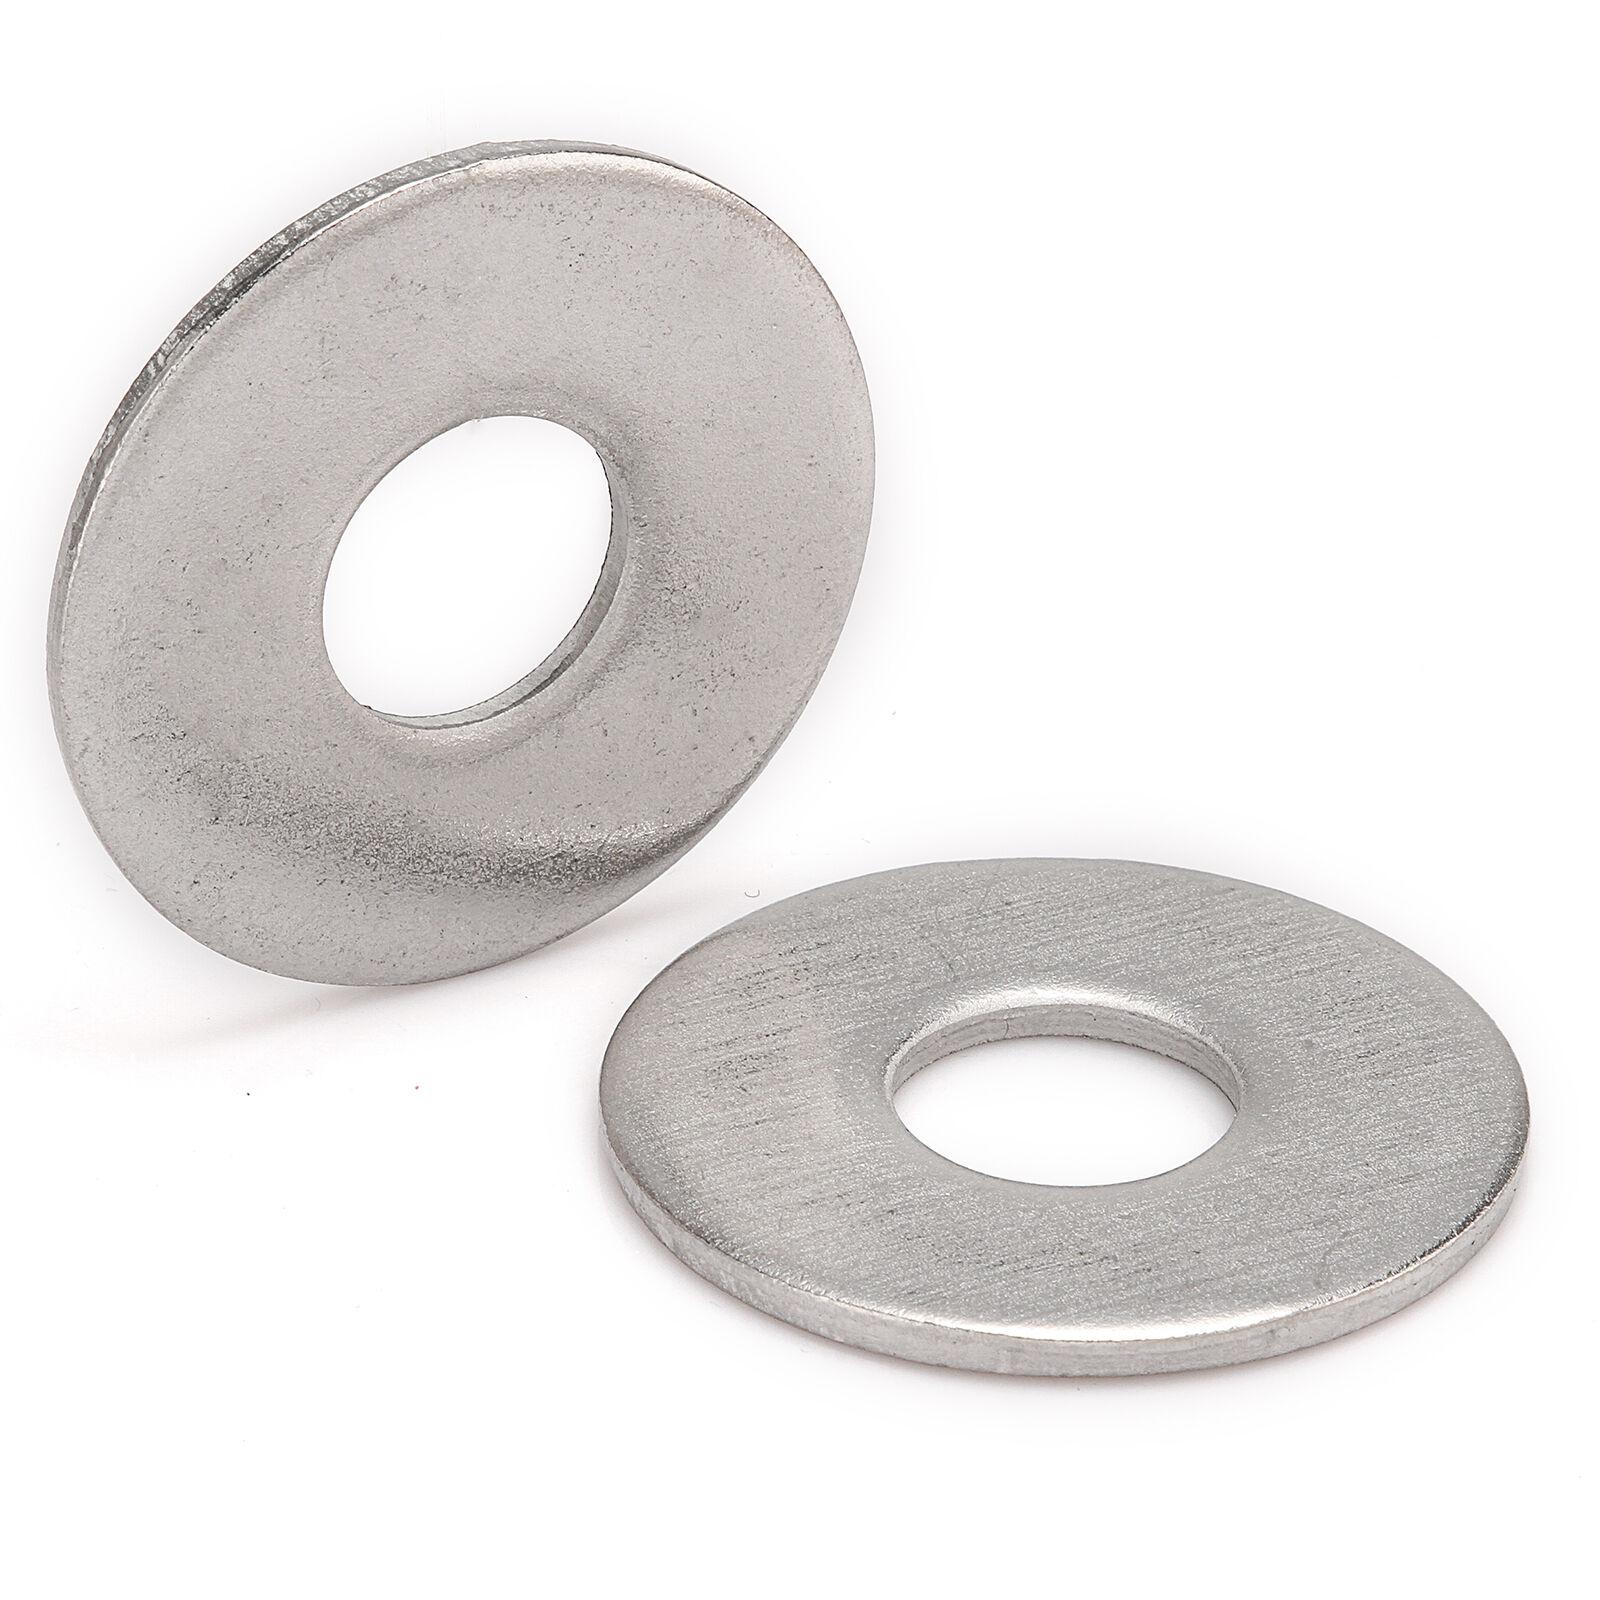 M3 M4 M5 M6 M8 M10 M12 M14 M16 M20 A2 Stainless Steel Penny Repair Flat Washers 8